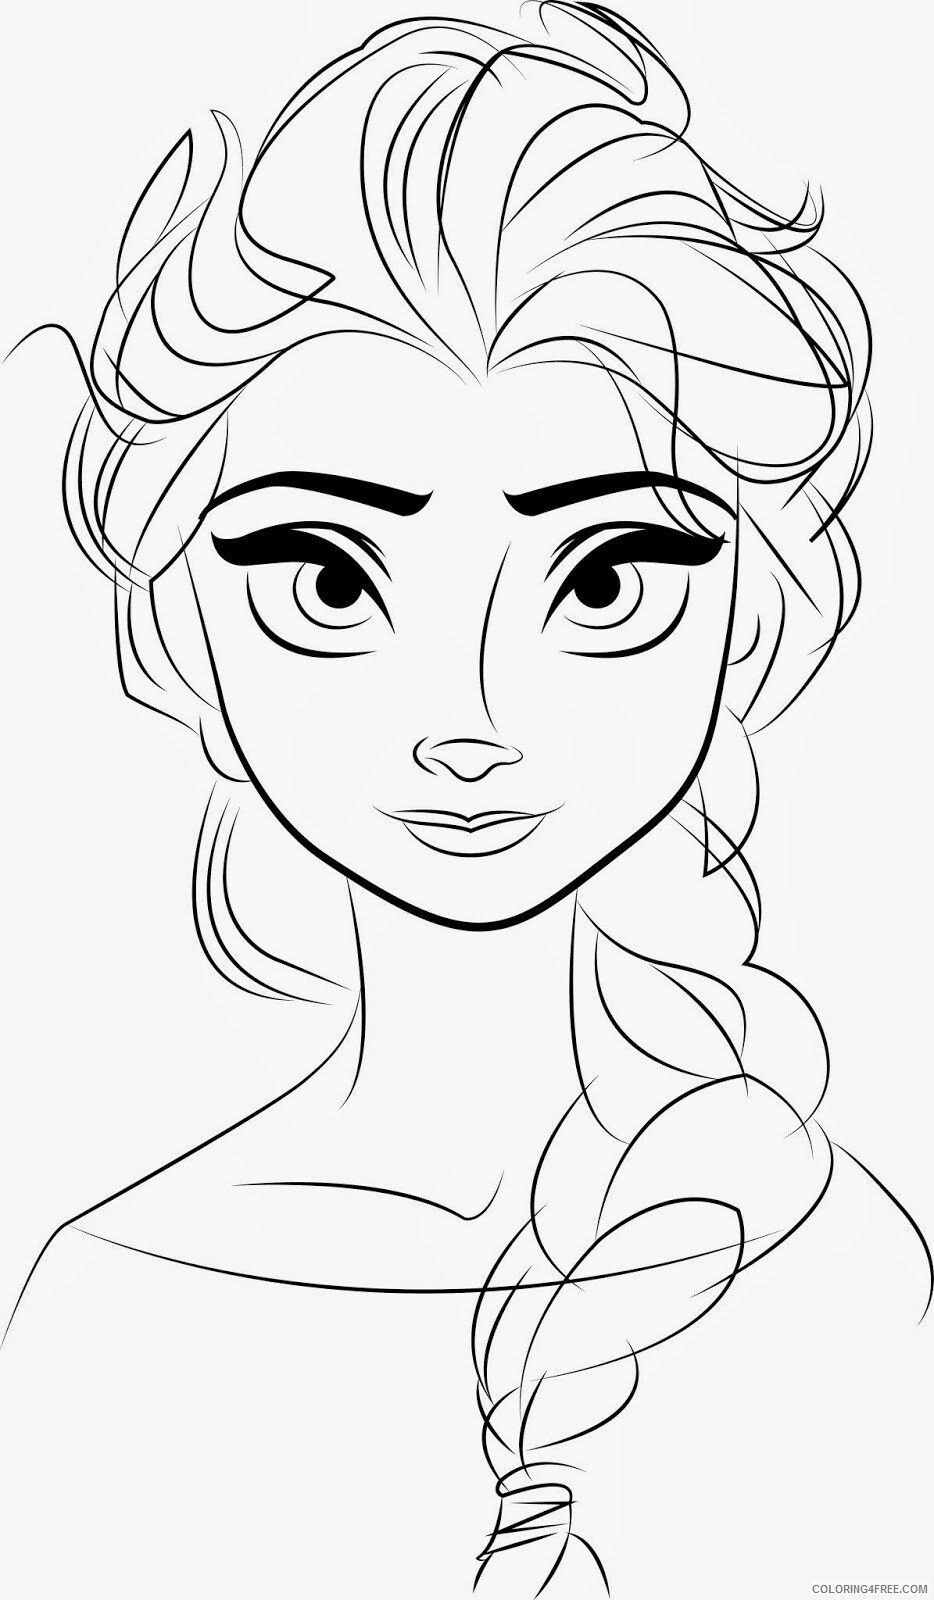 Elsa Coloring Pages Free Elsa Printable 2021 2133 Coloring4free